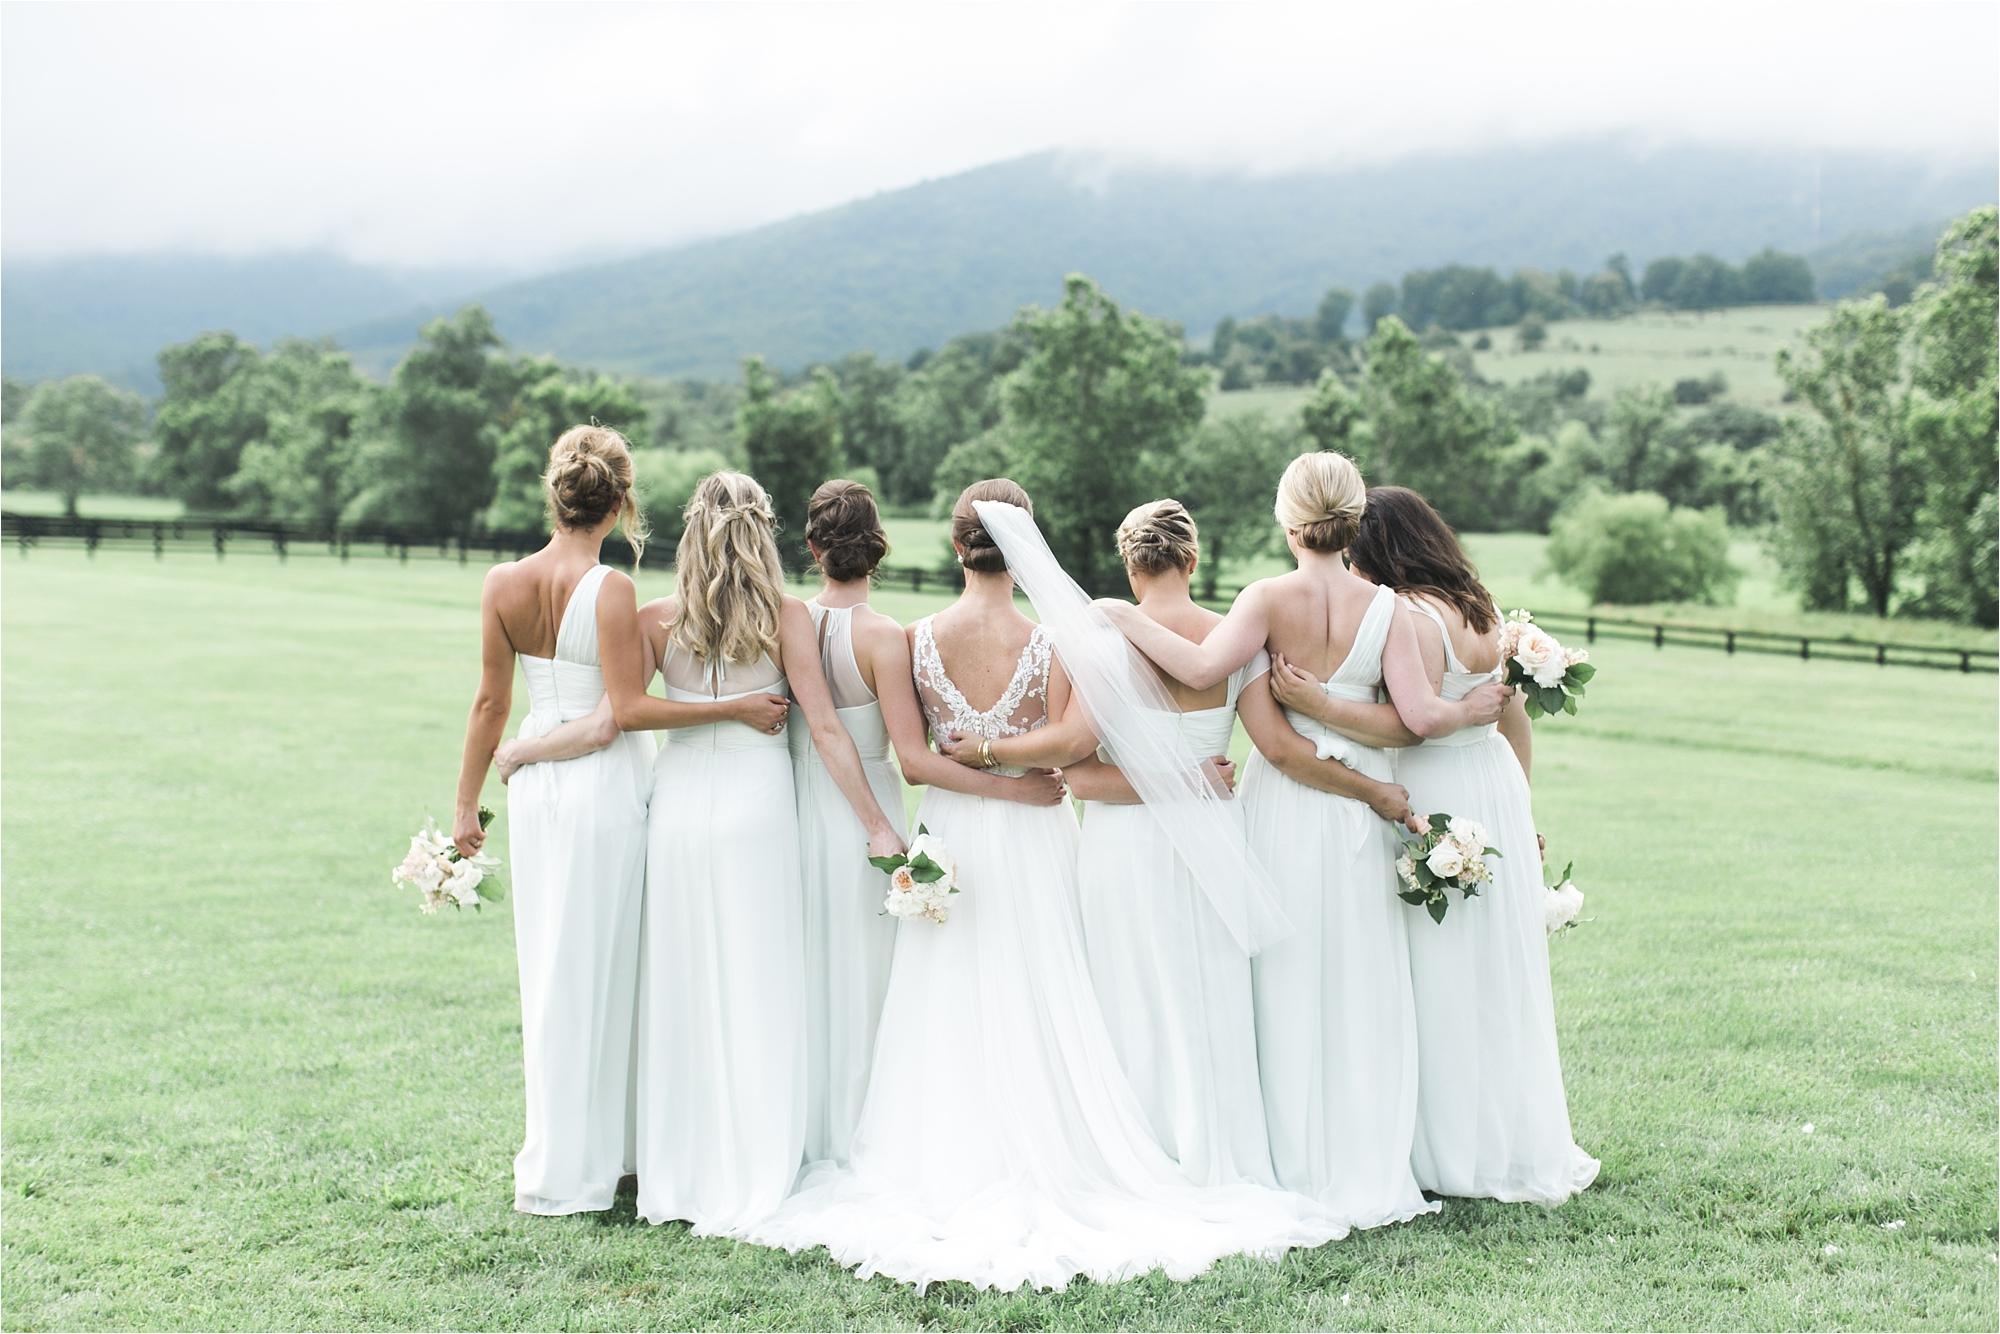 stephanie-yonce-charlottesville-virginia-king-family-vineyard-wedding-photos_0021.jpg